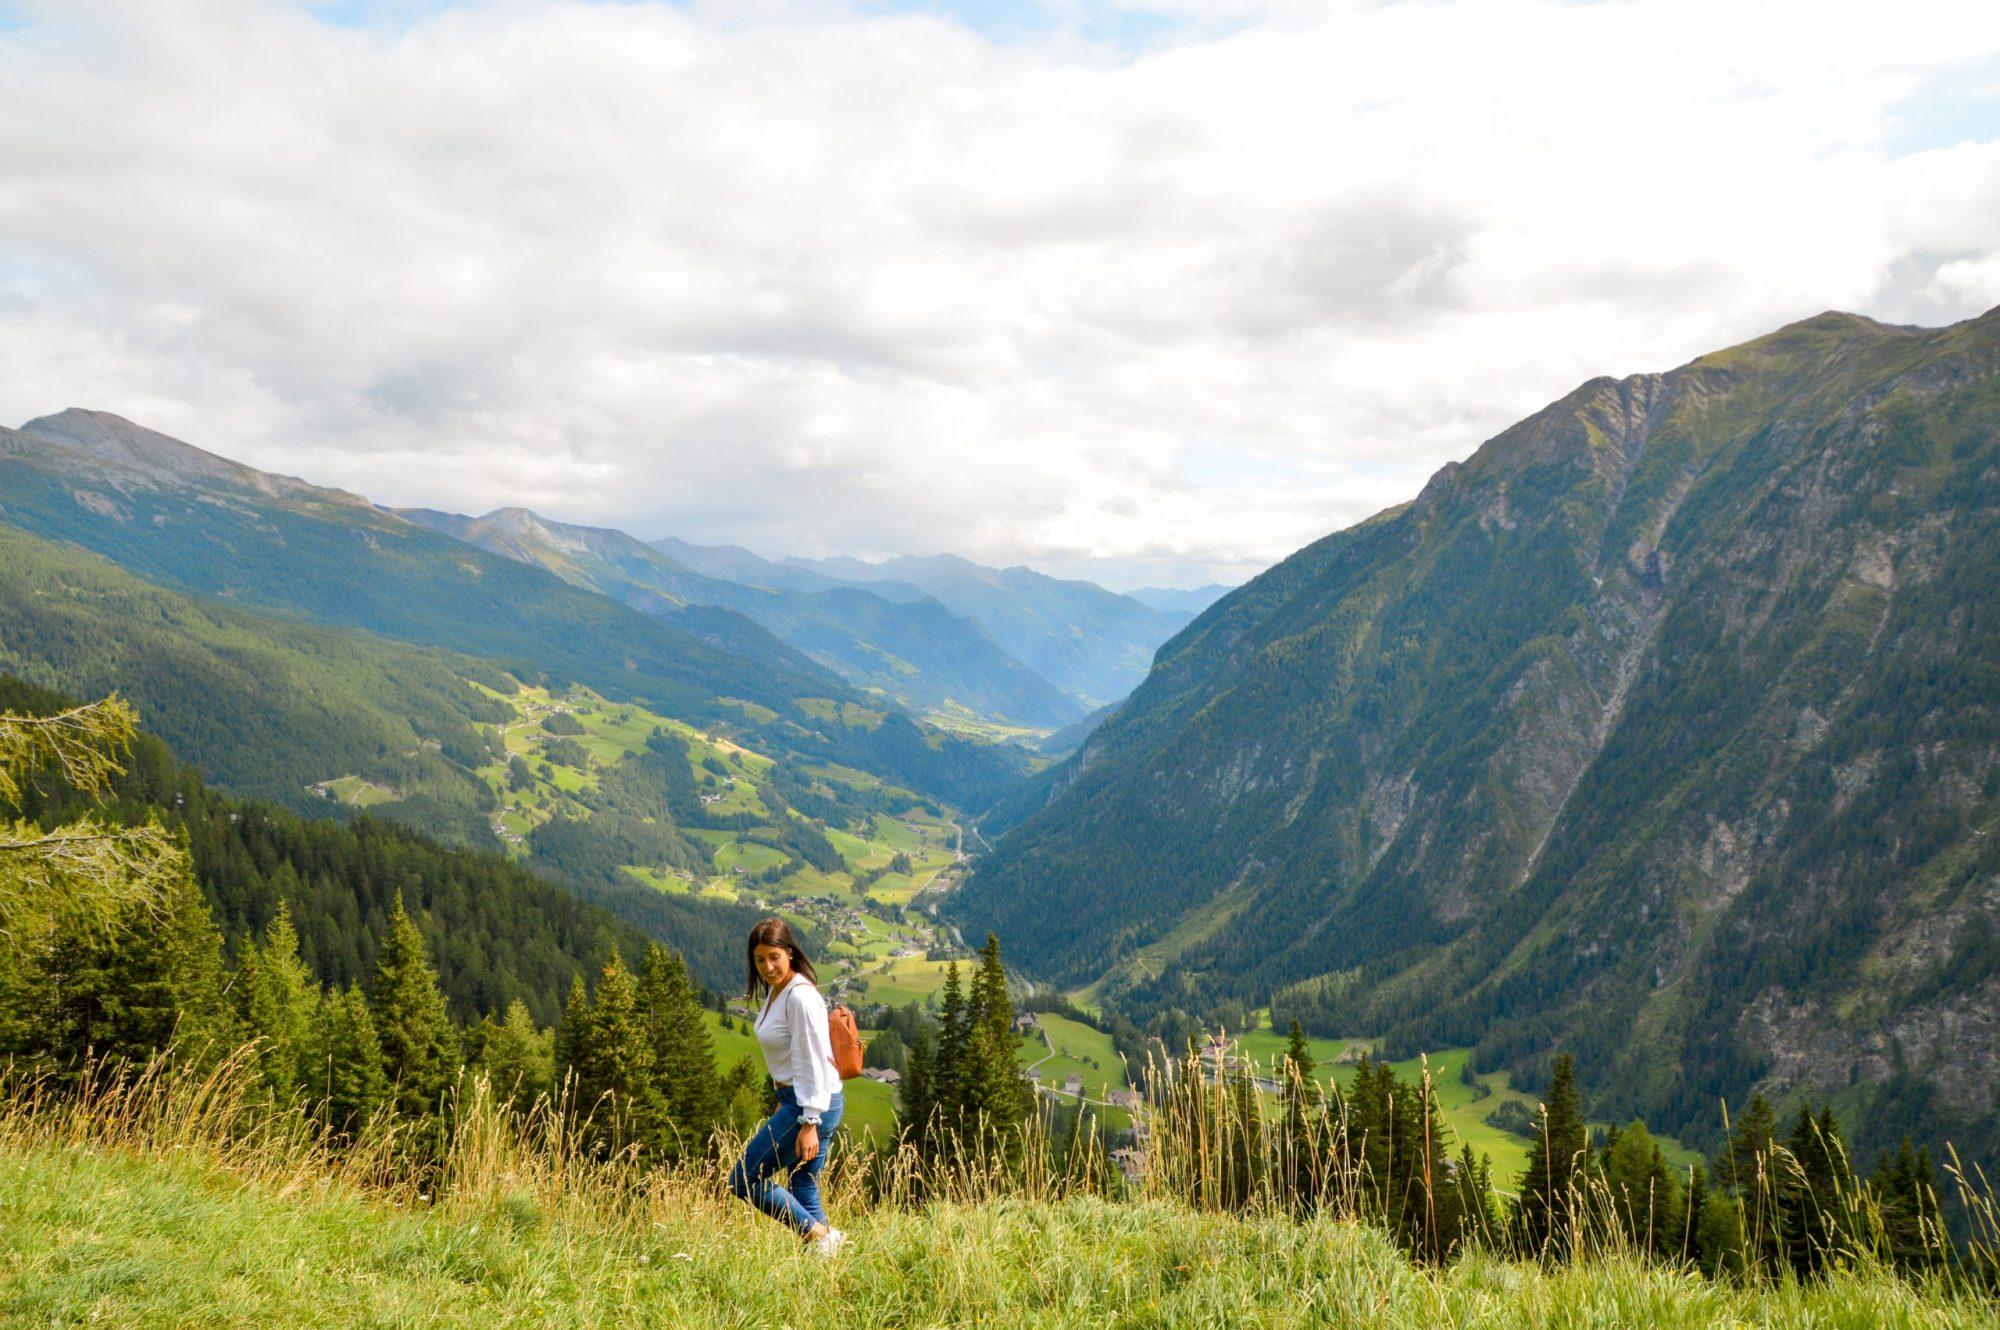 Carretera Grossglockner que ver en Austria